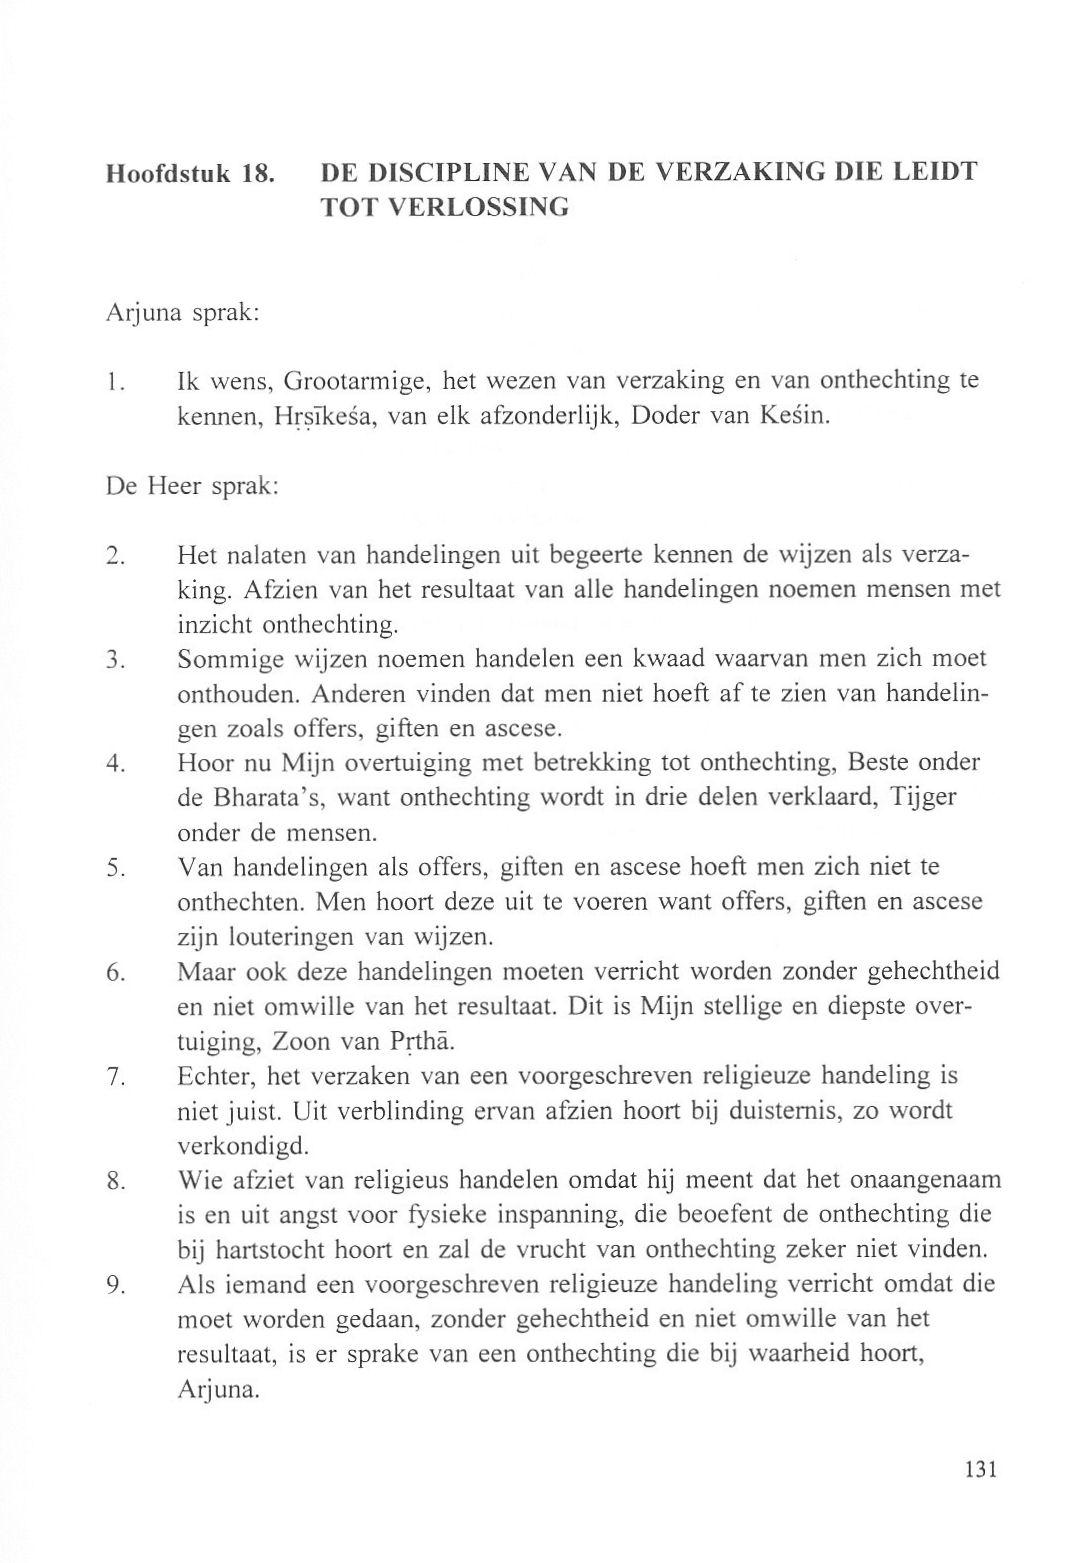 Citaten Uit Bhagavad Gita : Bhagavad gita hoofdstuk